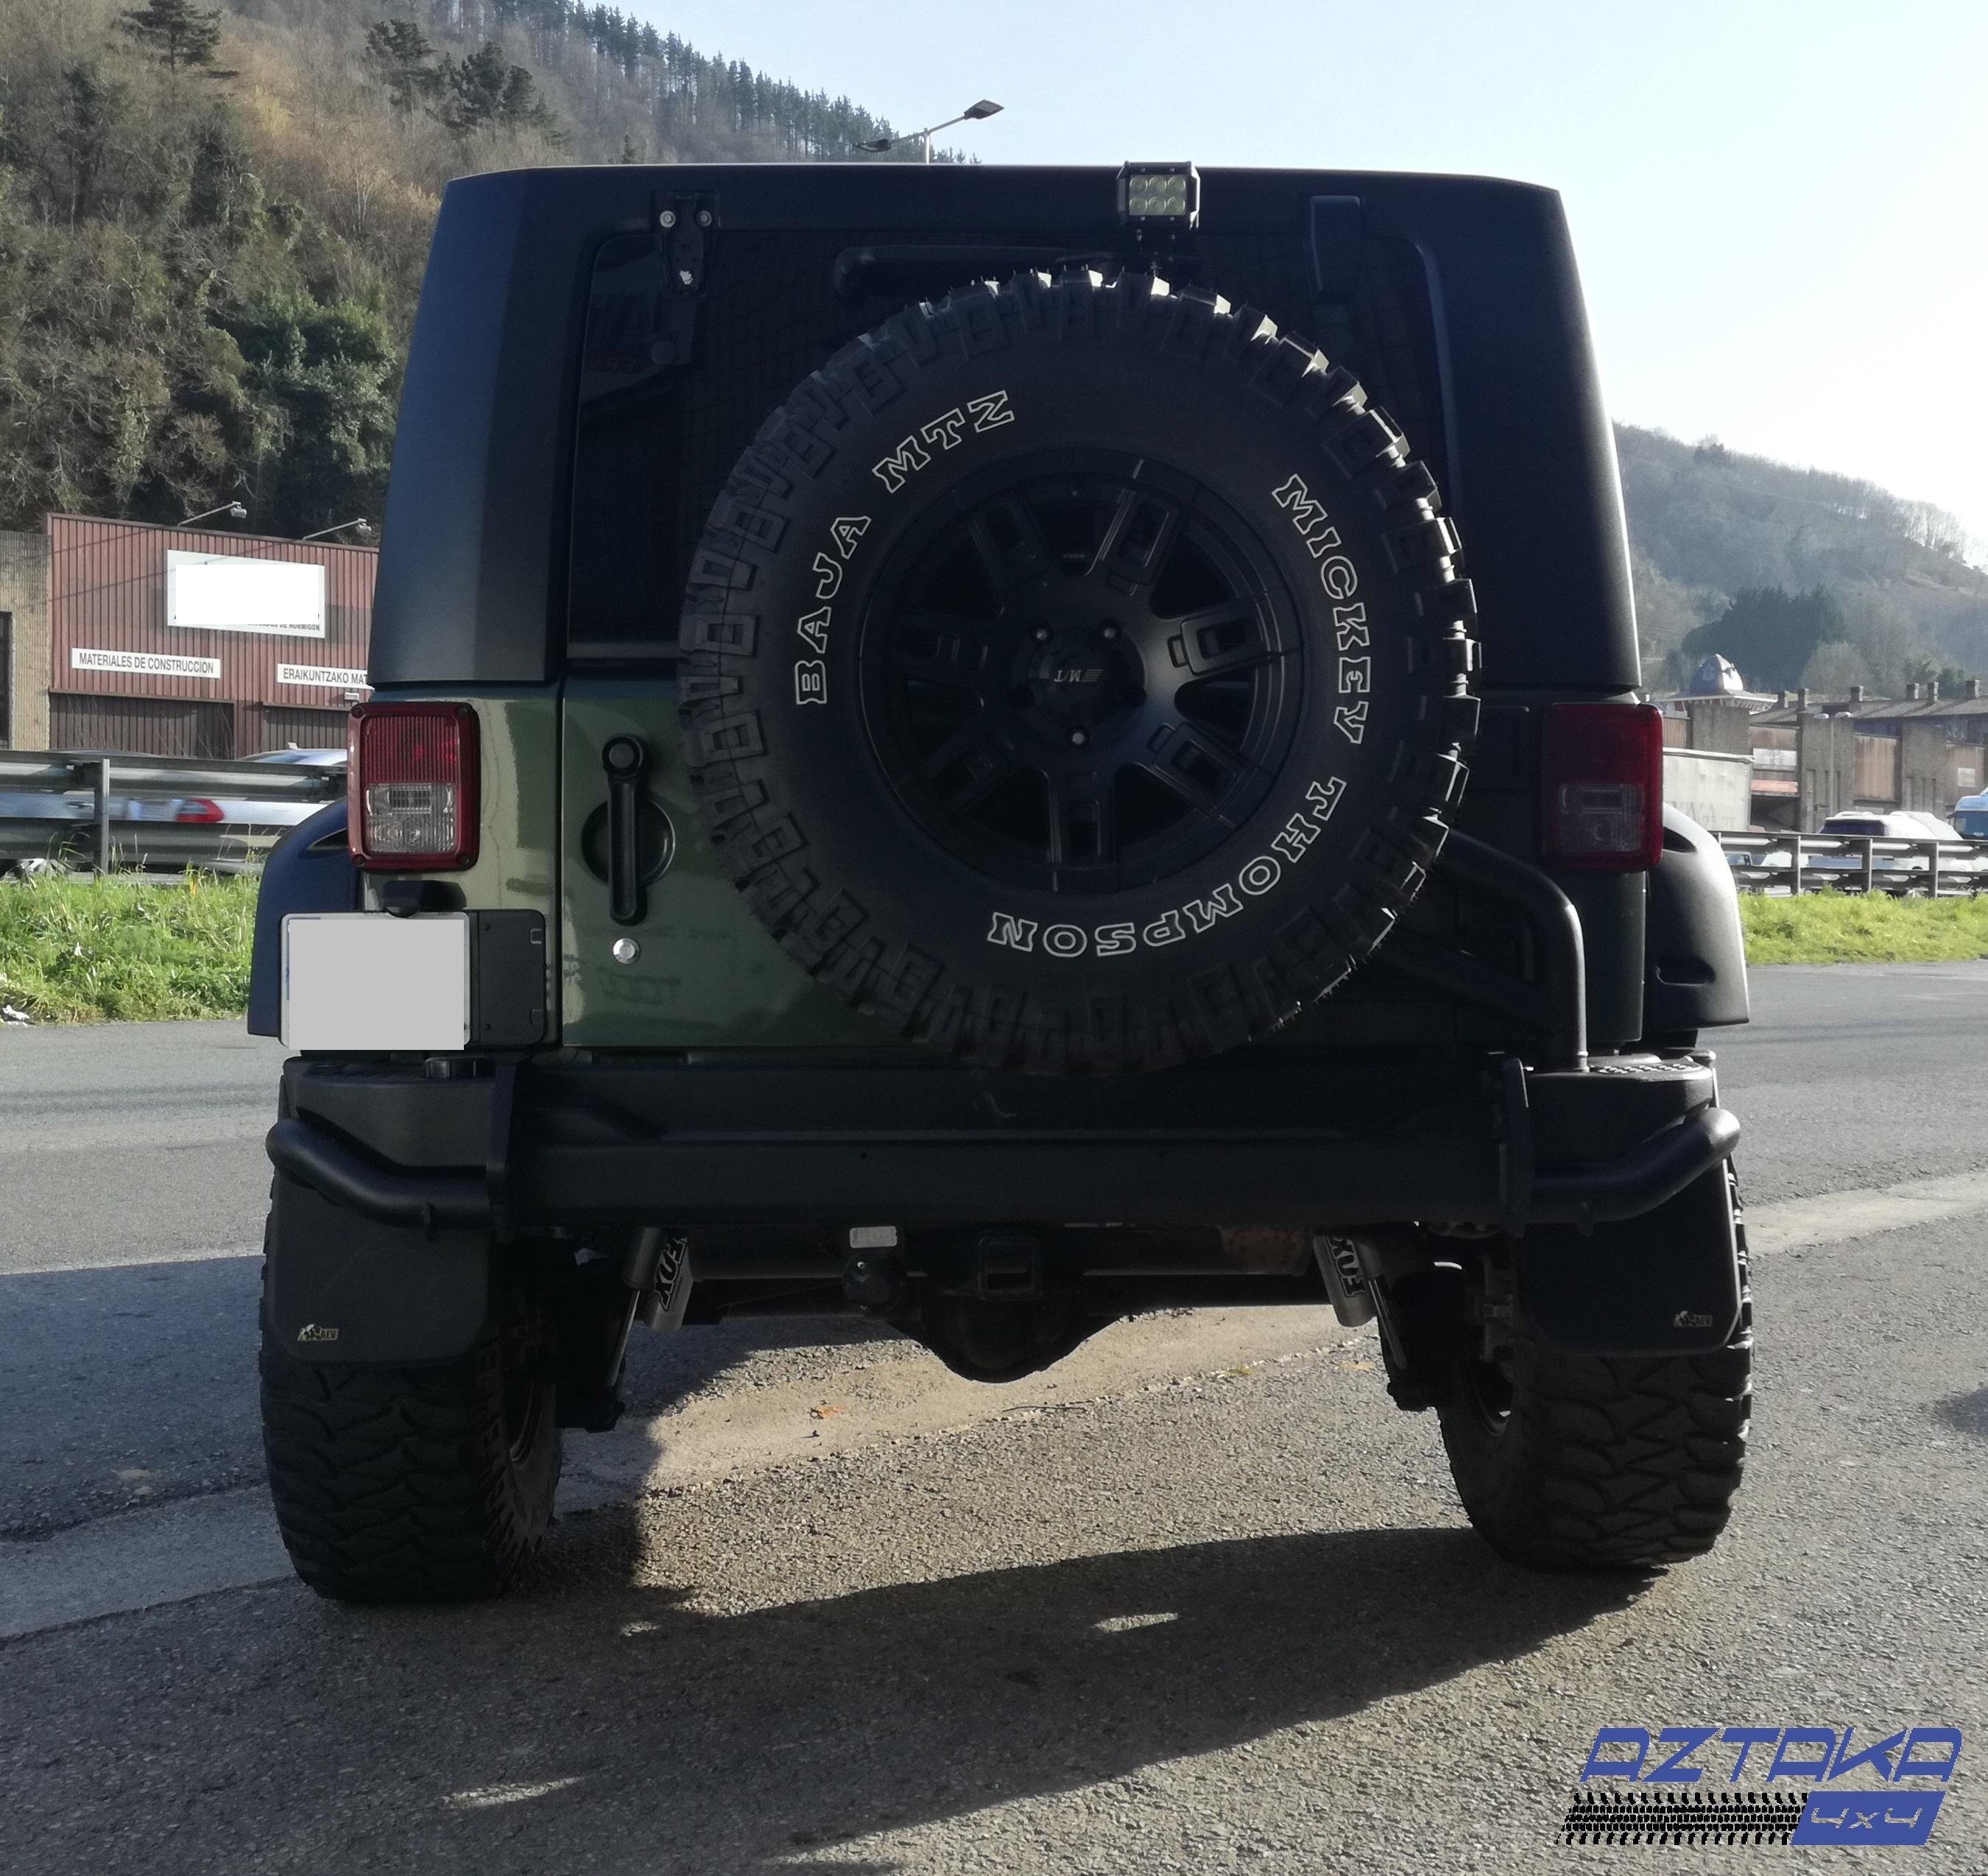 Jeep - luces